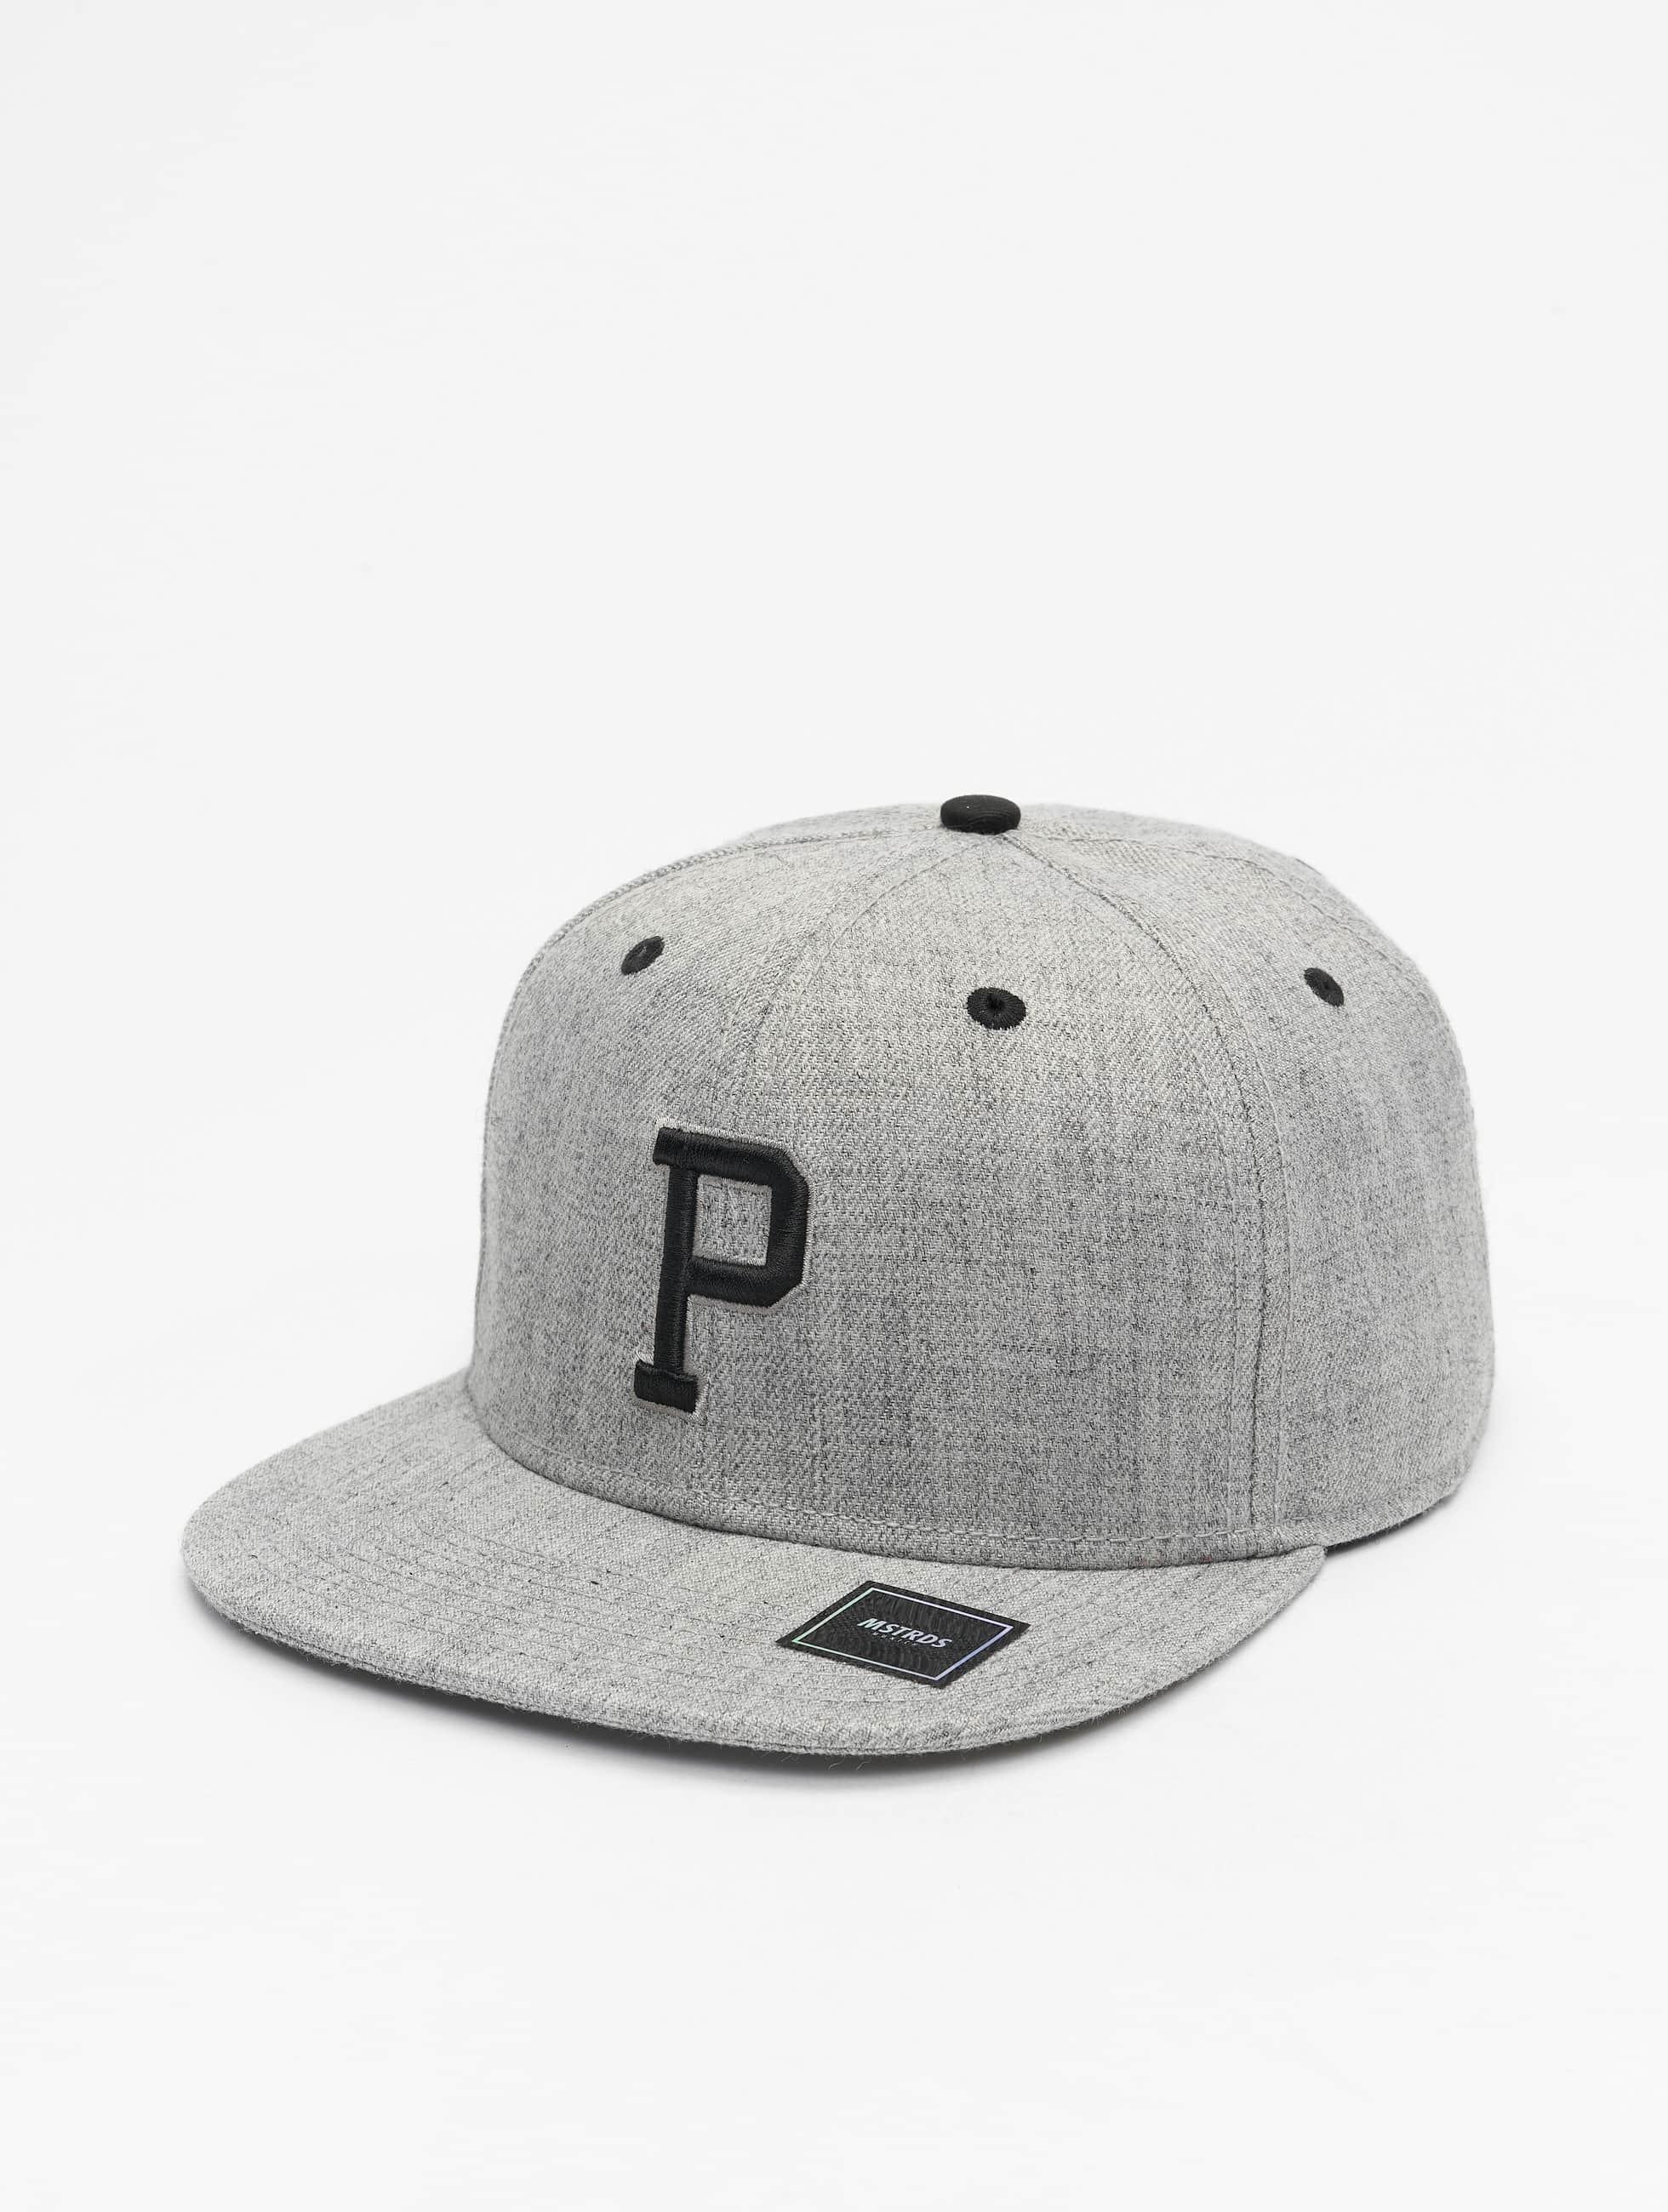 MSTRDS snapback cap P Letter grijs